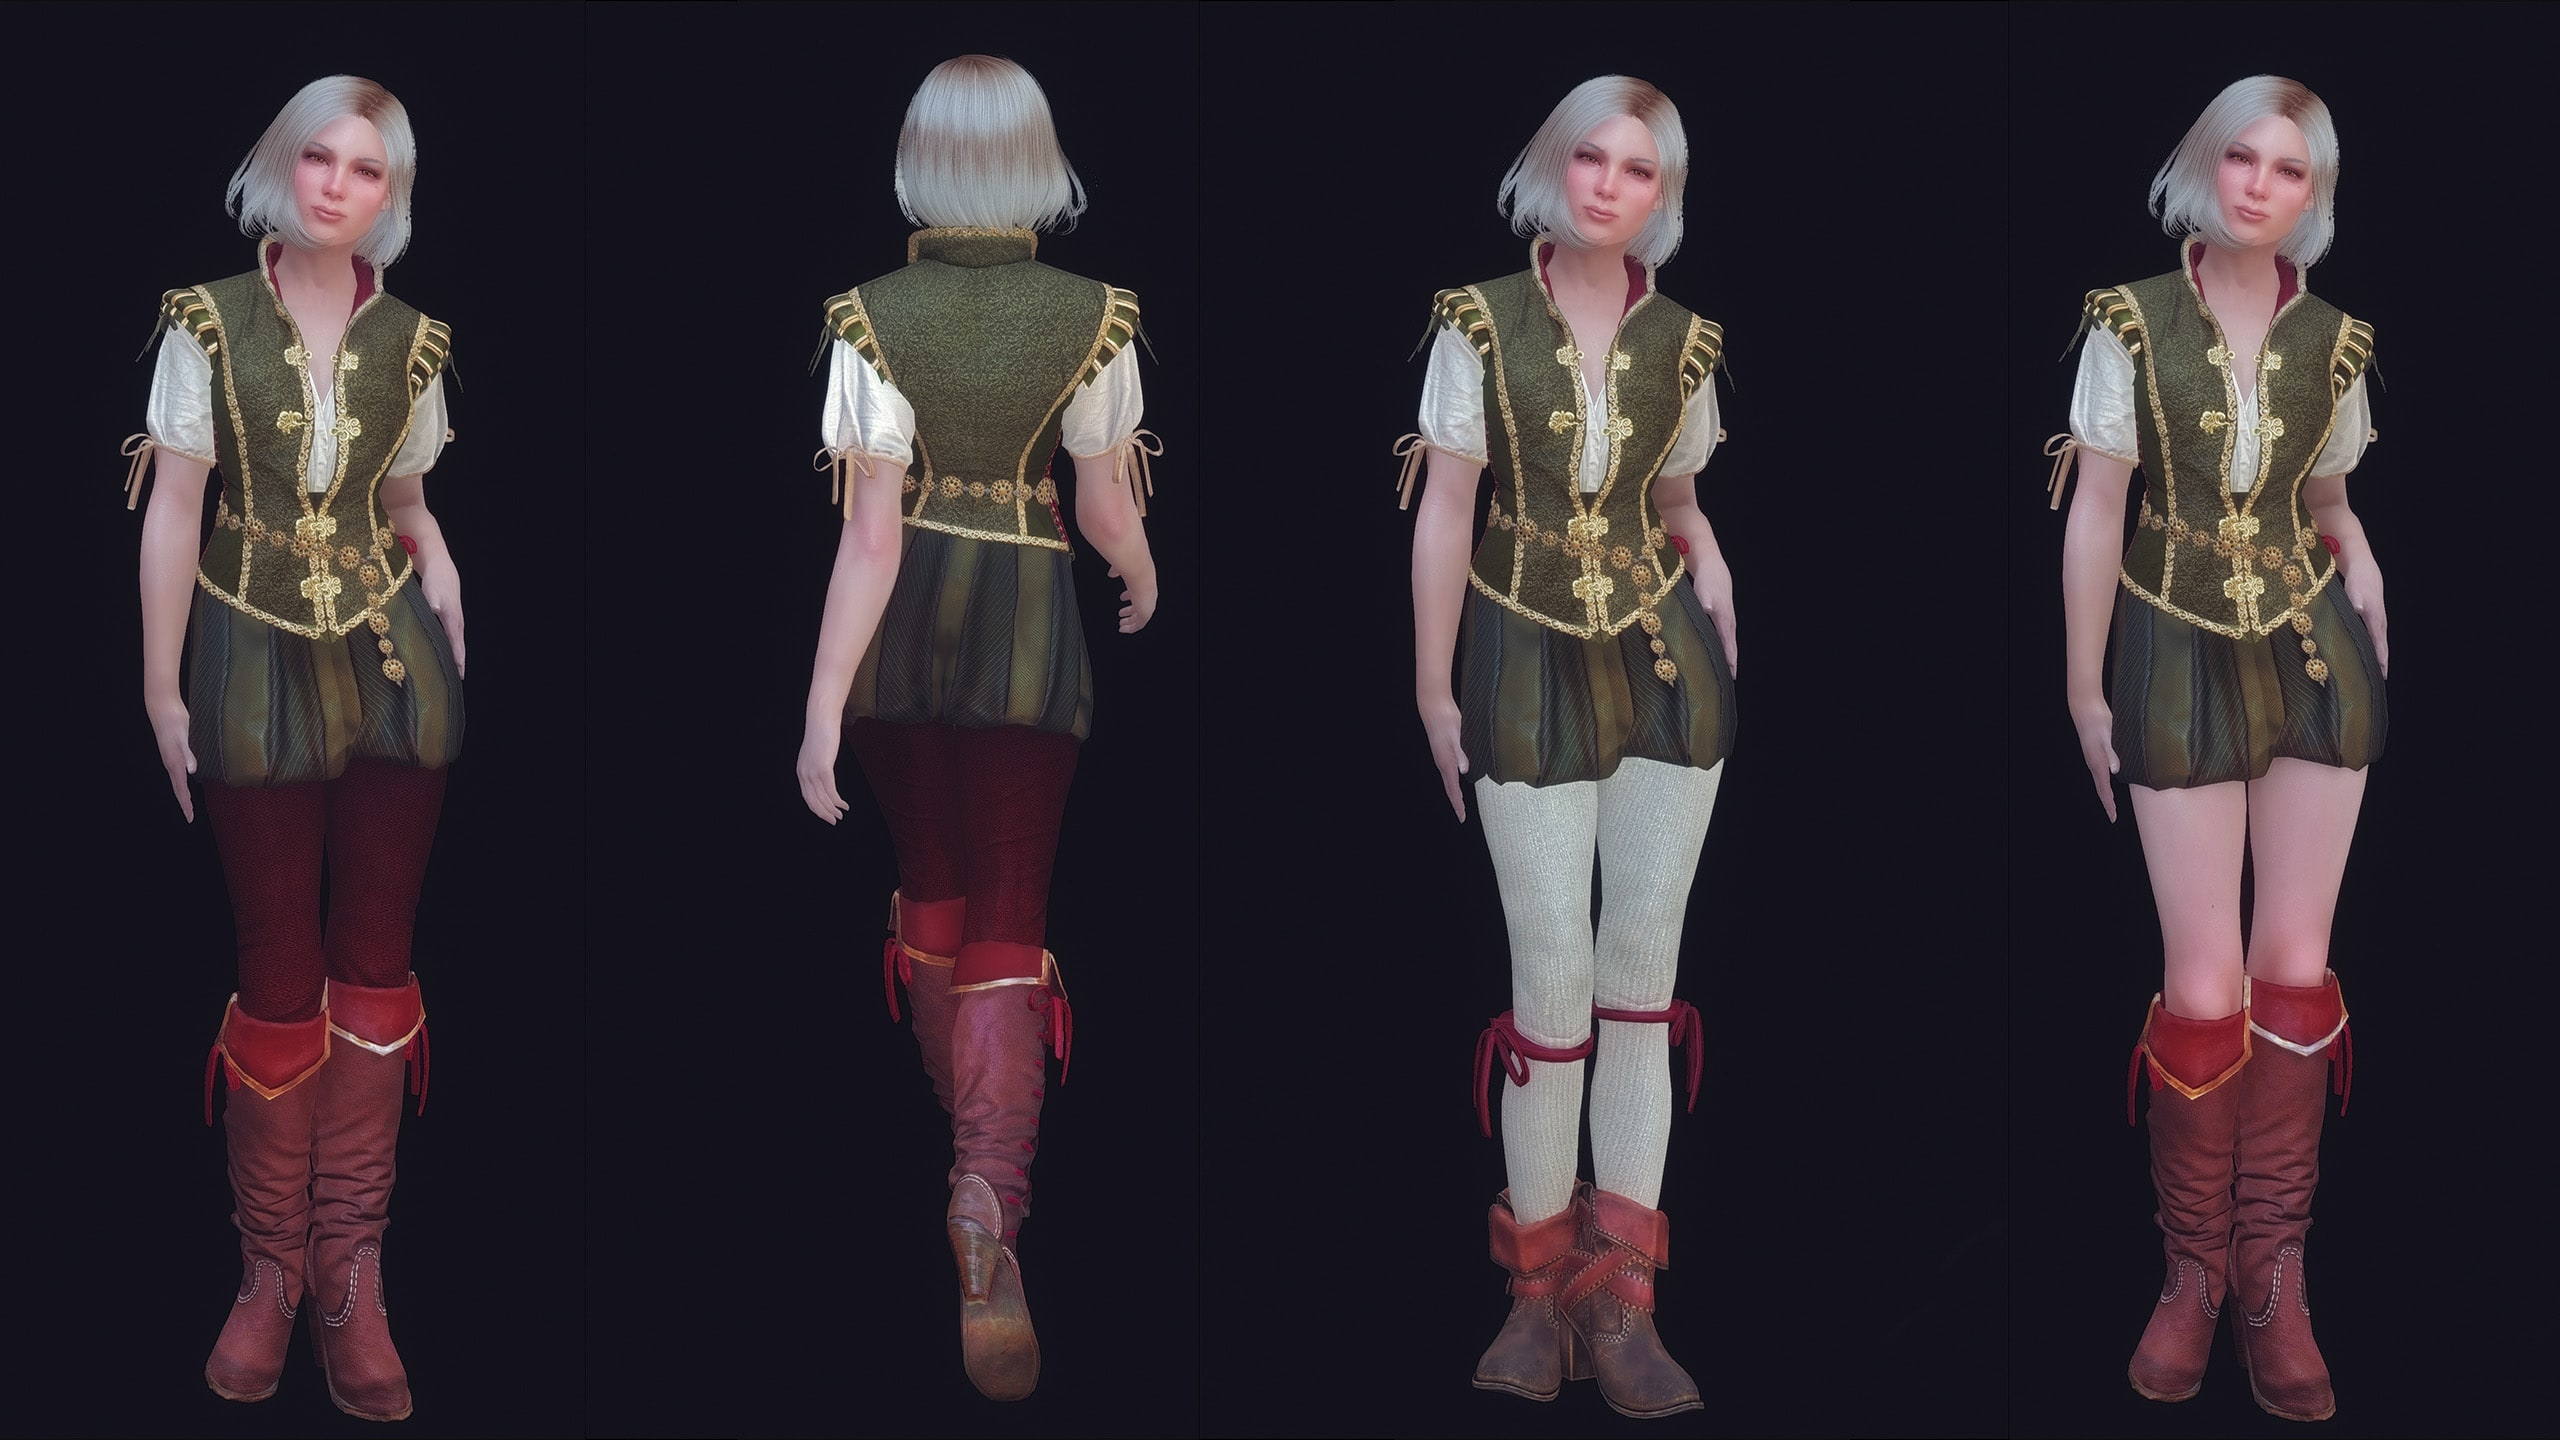 The Witcher 3 Shani Armor UNP | Броня Шани из Ведьмак 3